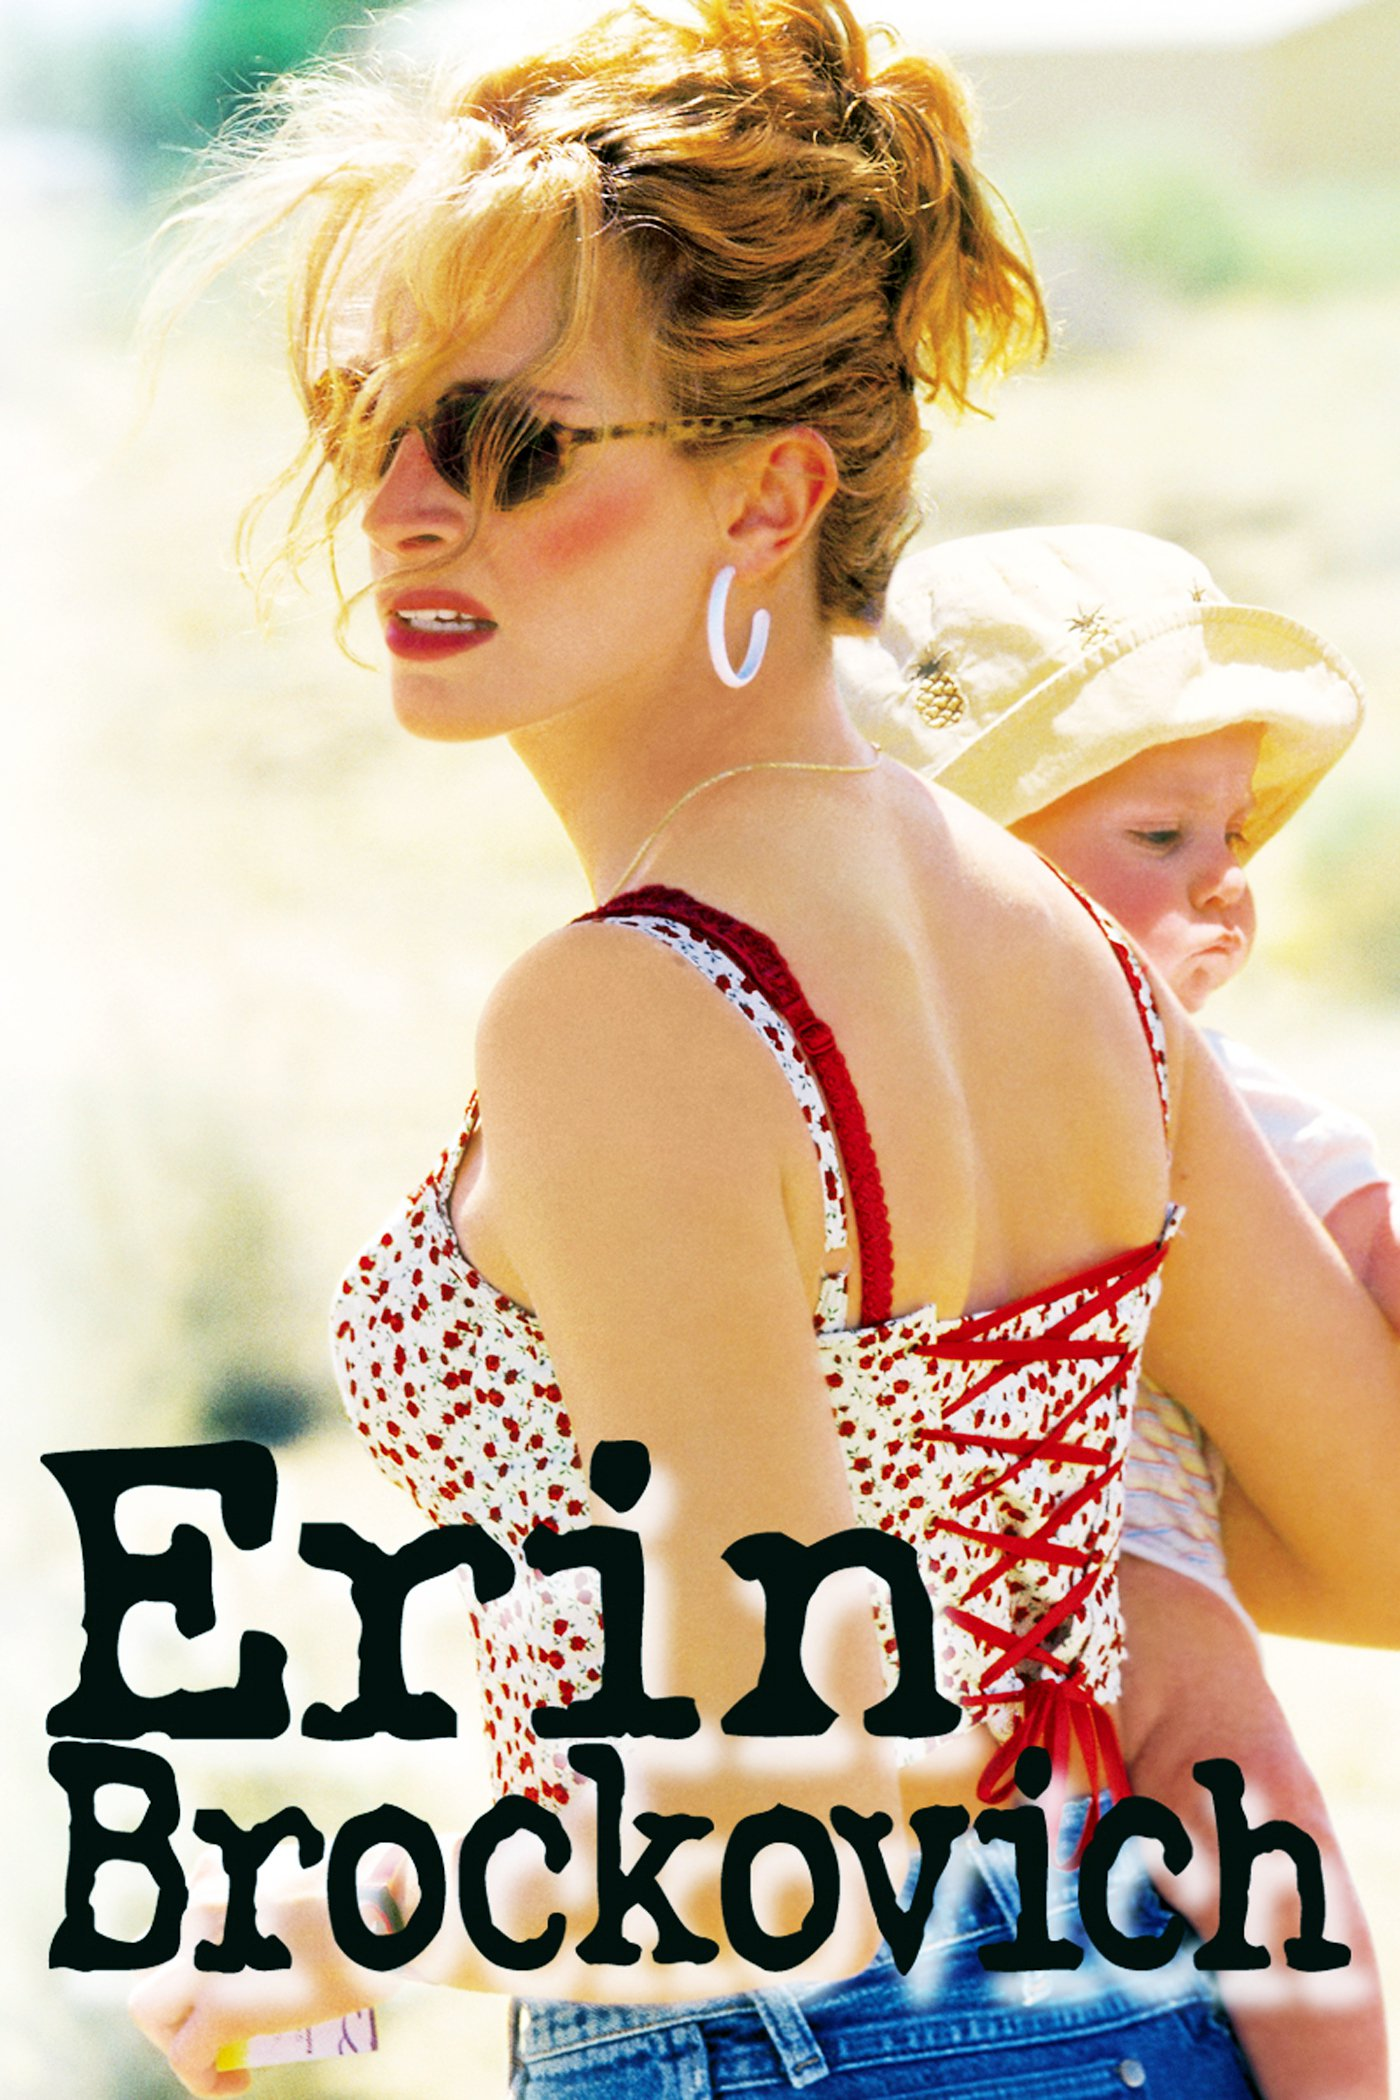 Erin brockovich movie review essay